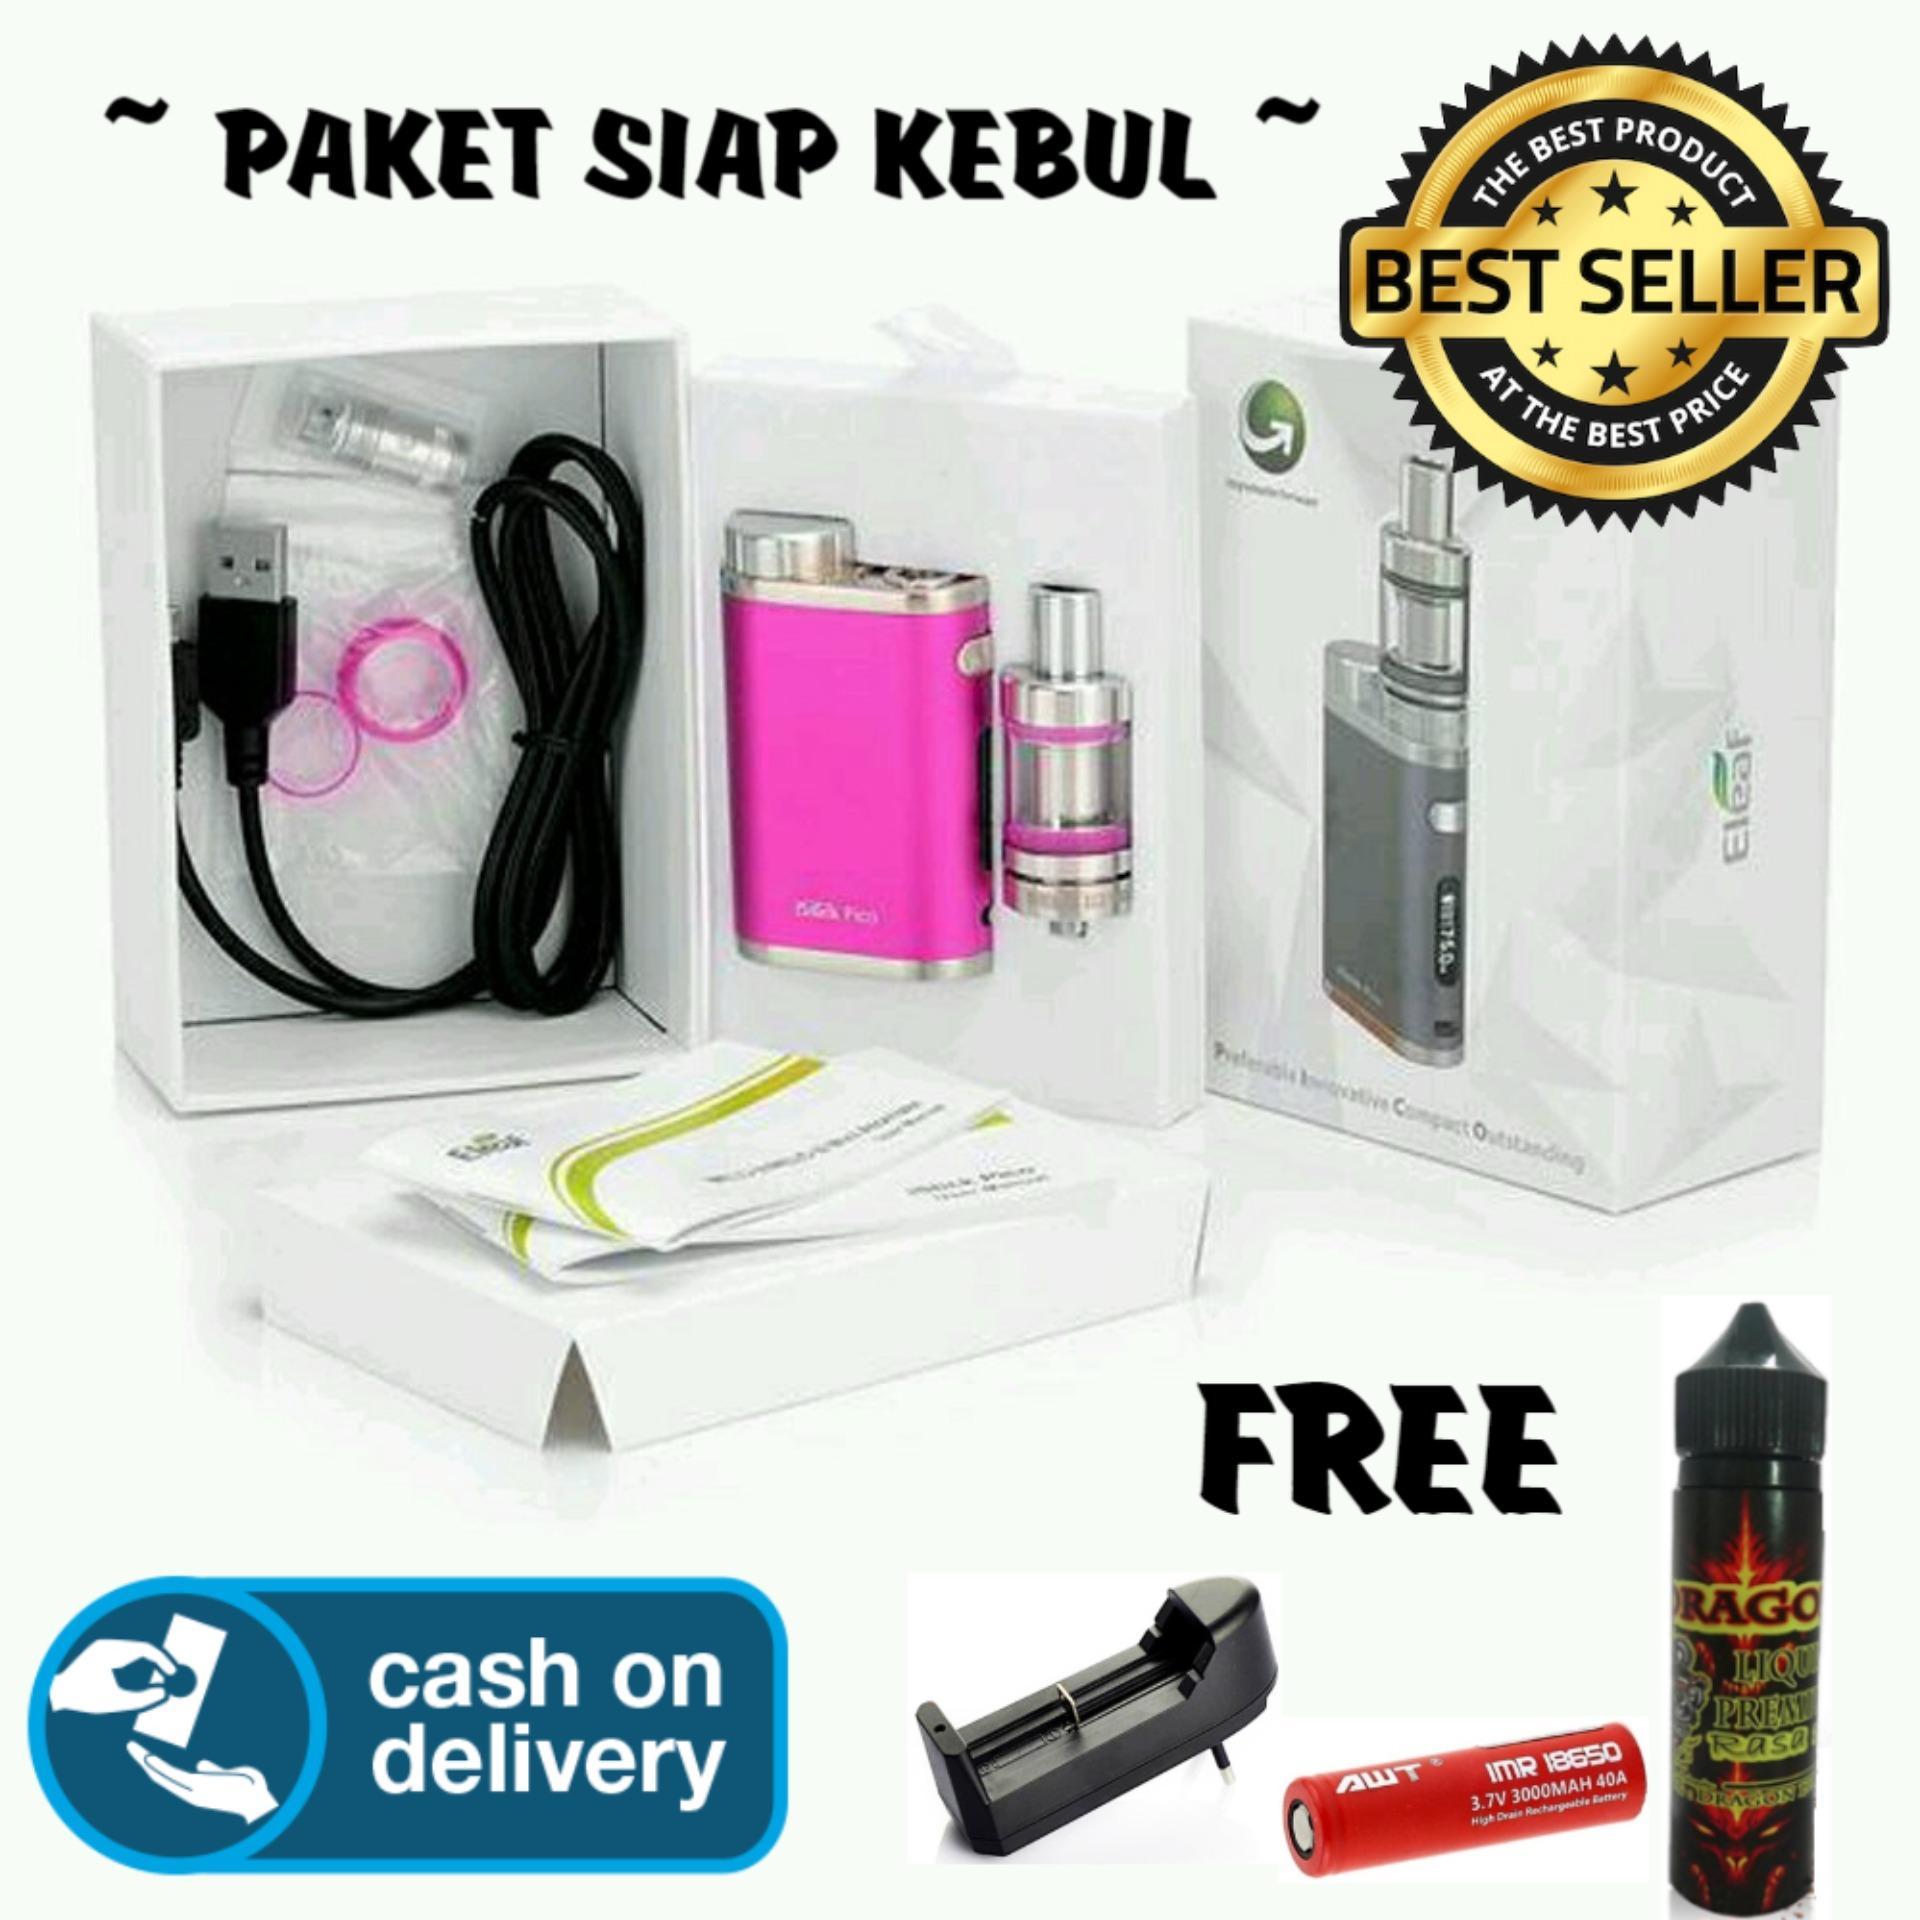 Kangertech Subox Mini Starter Kit Mod Vaporizer Include Battery Paket Ngebul Komplit Istik Fico 75w Vape Rokok Elektrik Jual